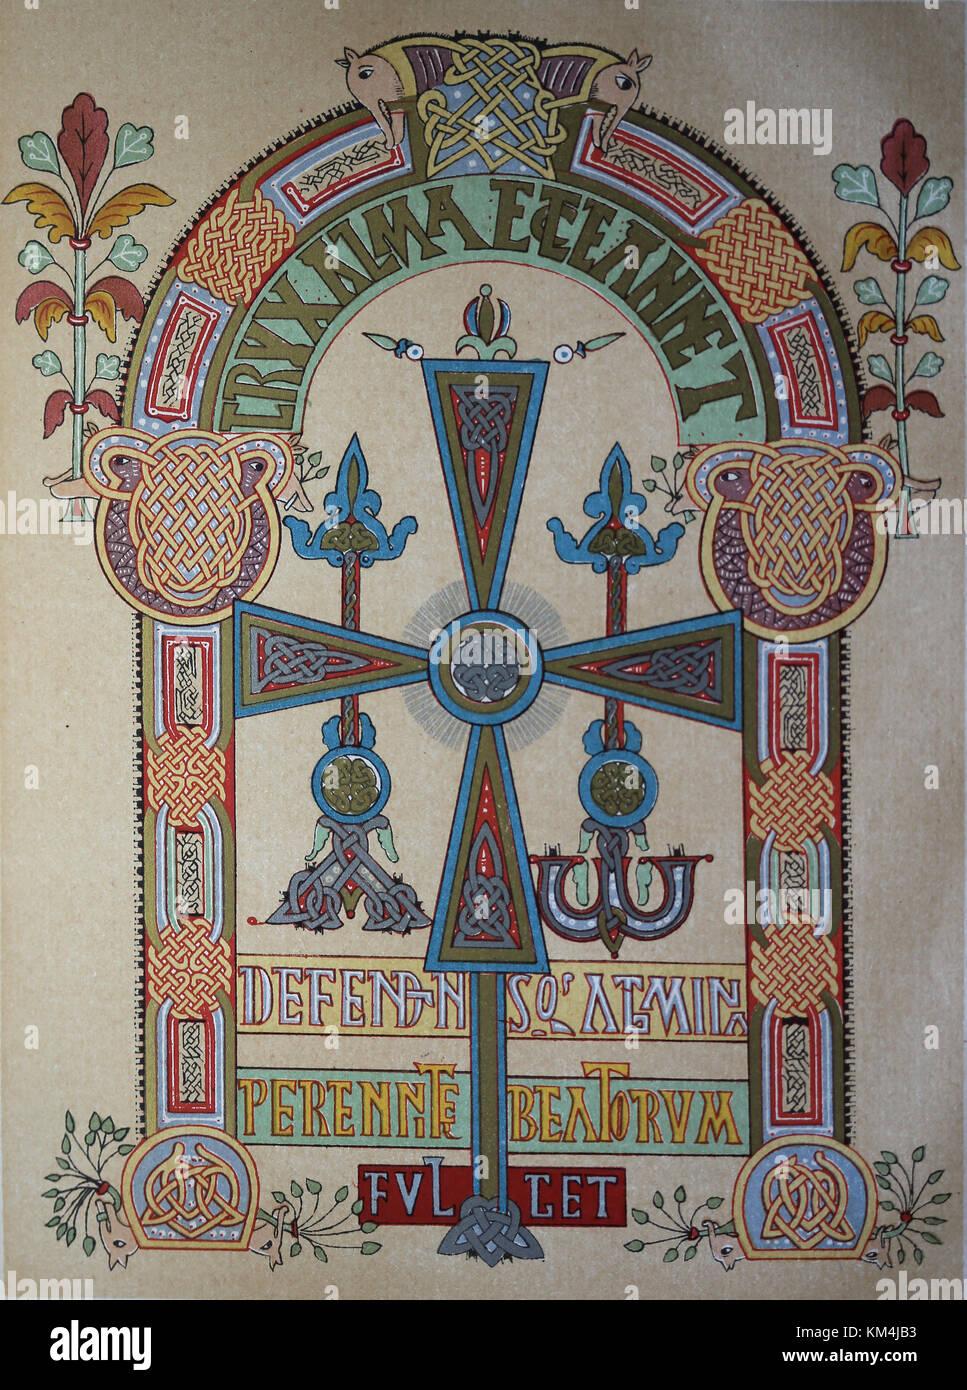 Pre-romanesque and Mozarabas. Codex Vigilanus. Ilustrated version of Chronicon Albeldense, 976. Visigothic cross. - Stock Image